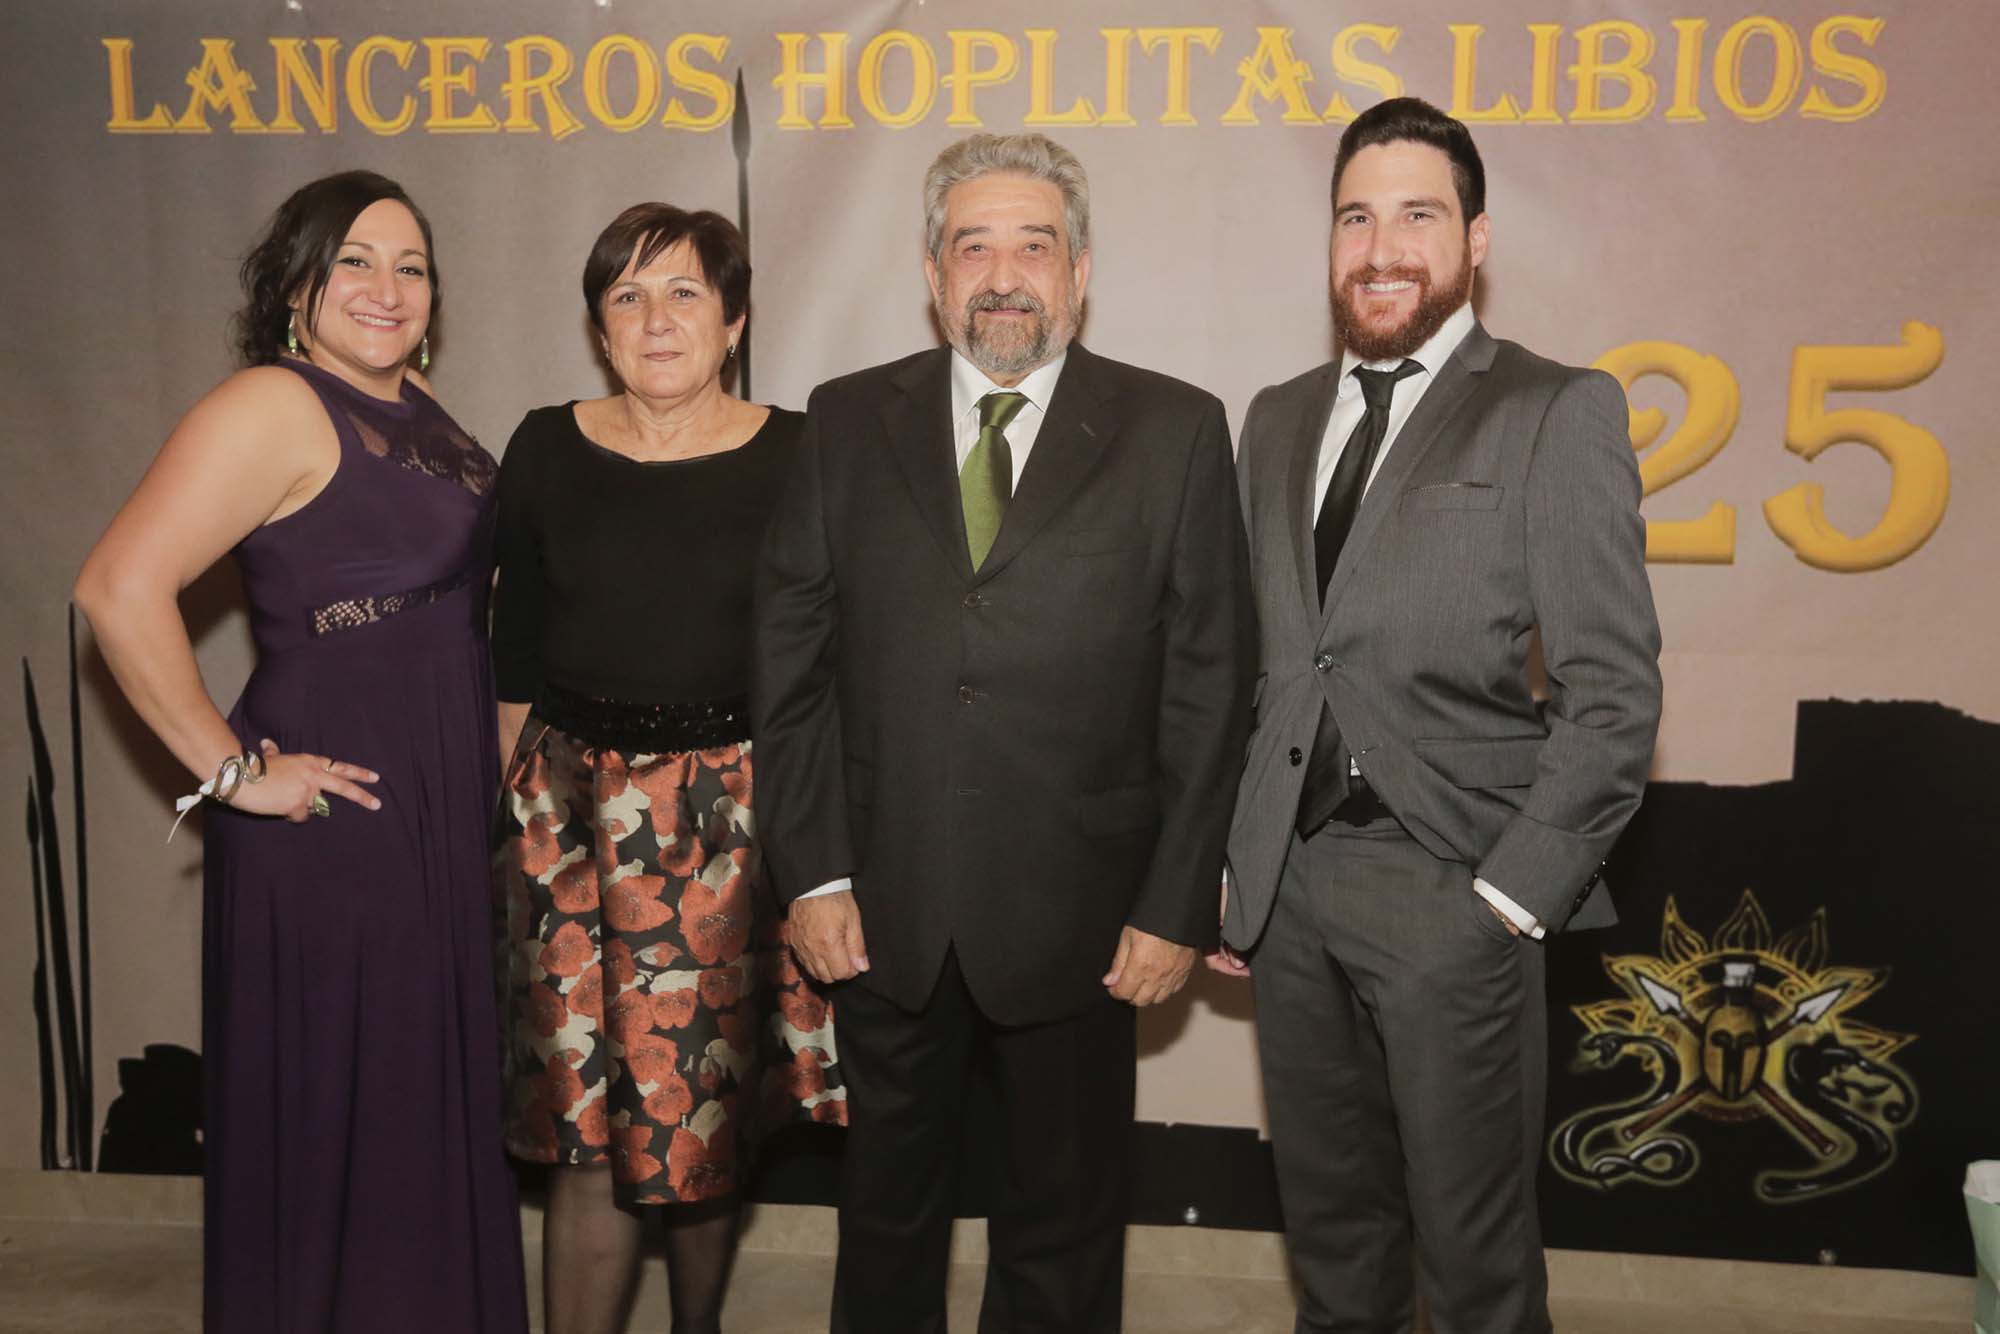 Lanceros Hoplitas Libios  (195)